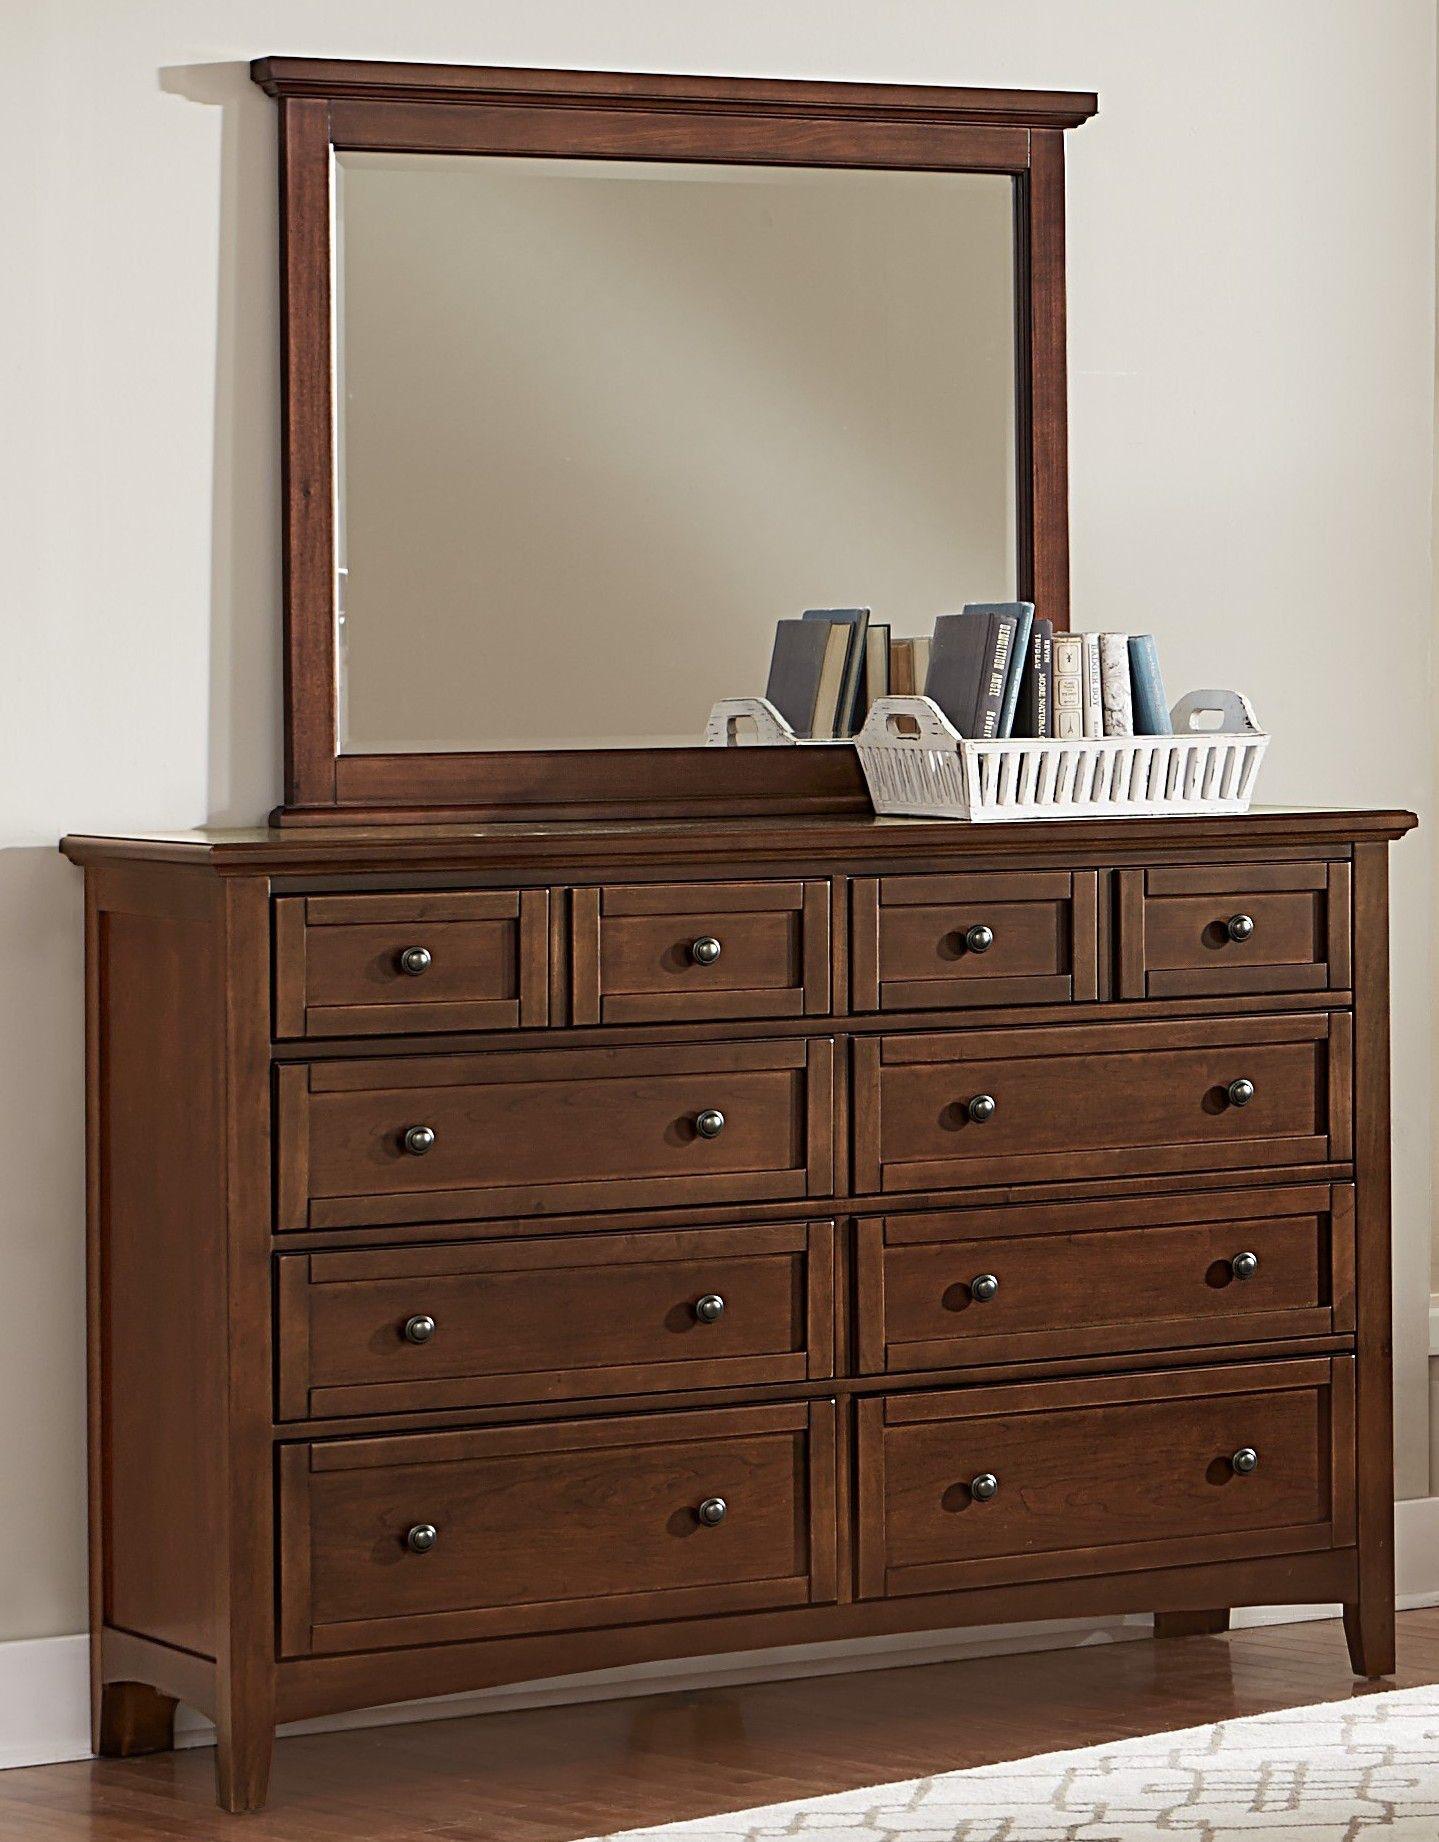 Vaughan Bassett Furniture Company Bedroom Triple Dresser Bb28002